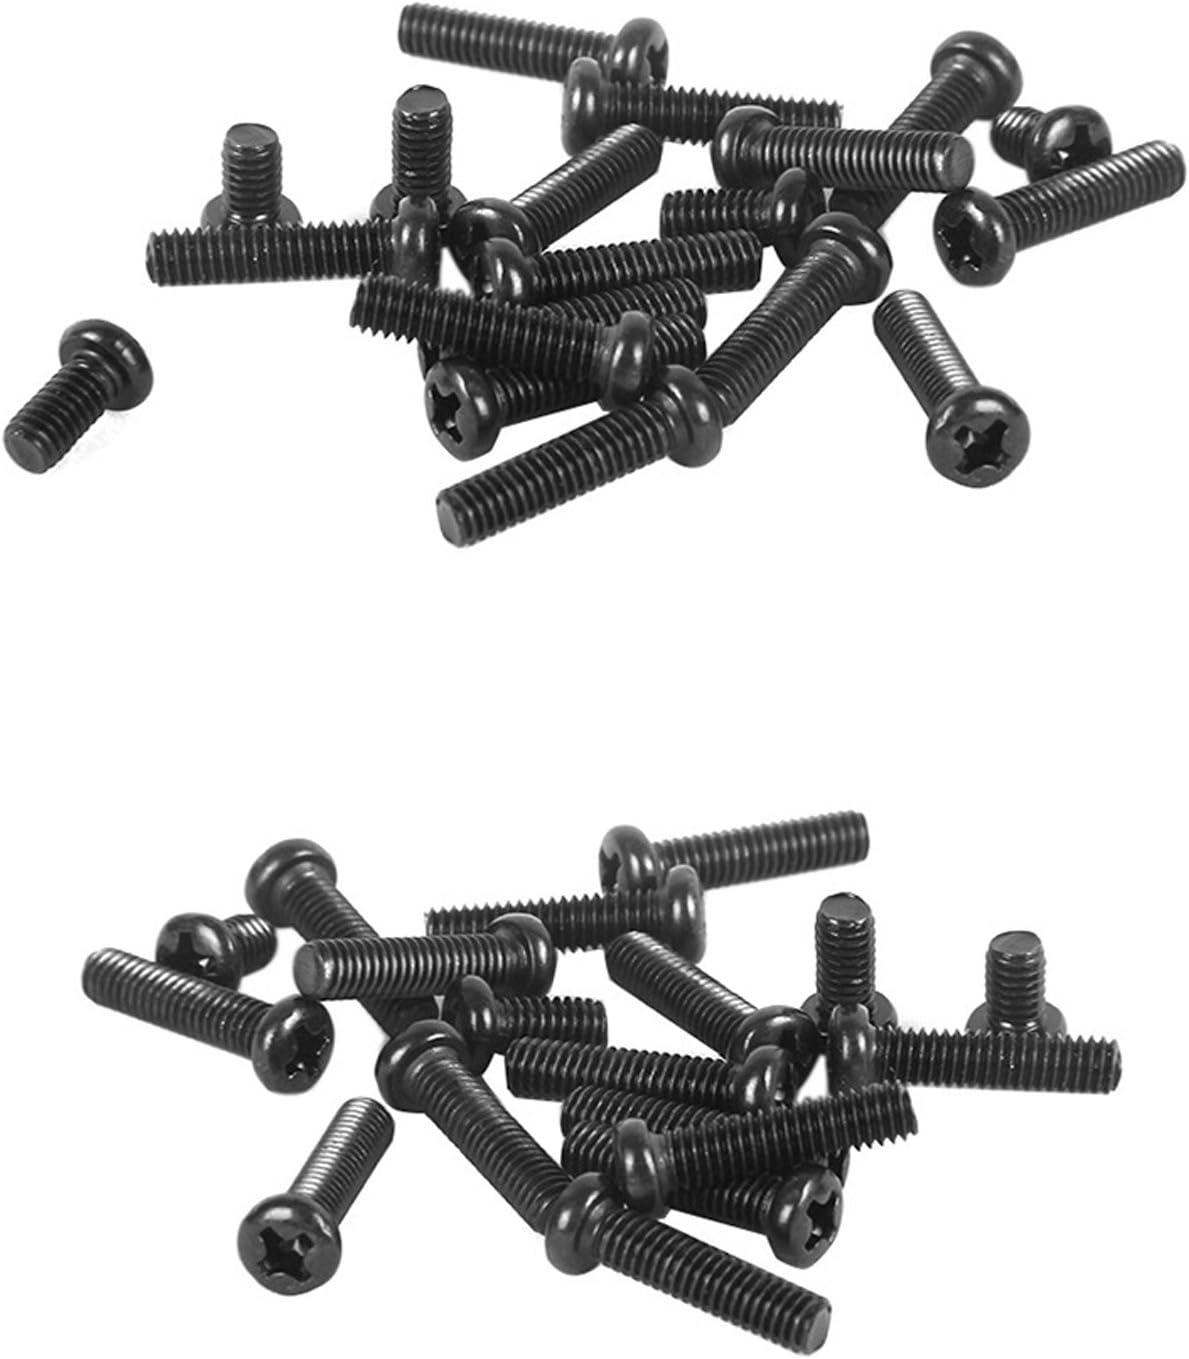 Negro /óxido de acabado M3/M4/rosca tama/ño 8/mm a 20/mm Longitud comdox 320-pack Phillips Cruz washer-head m/áquina tornillos tuercas surtido Kit totalmente roscados de acero al carbono